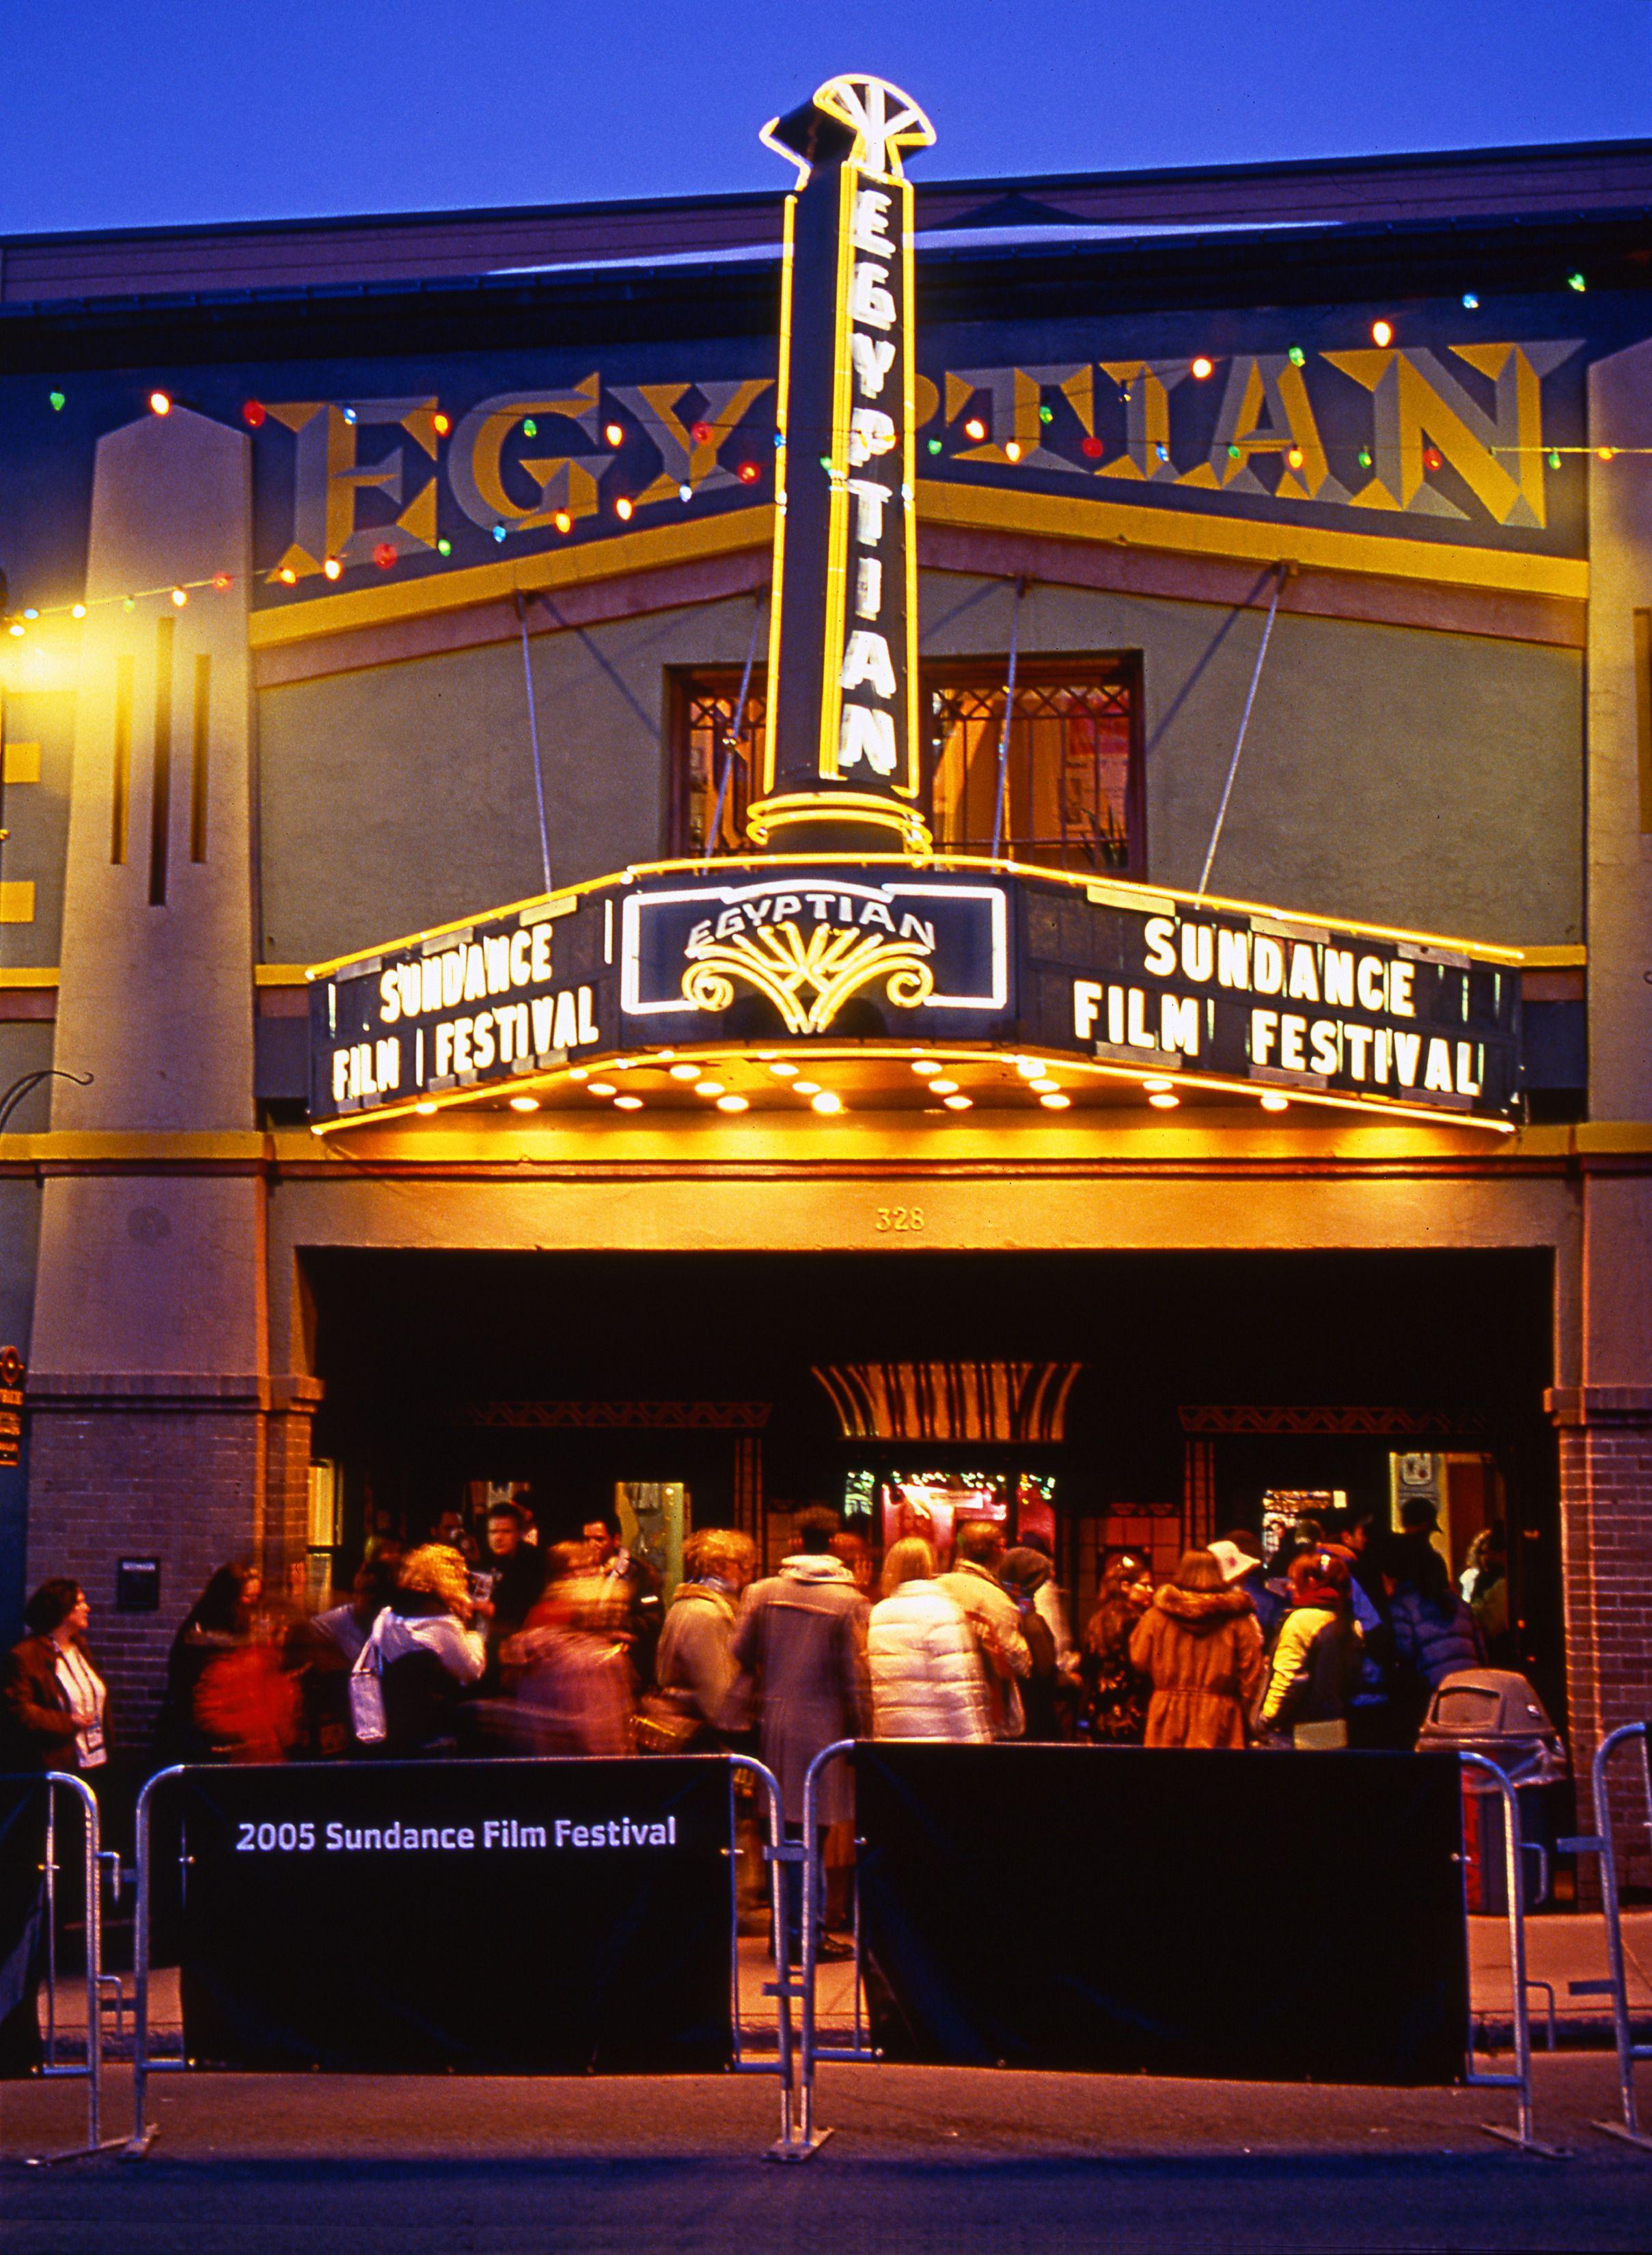 January the sundance film festival is held in park city